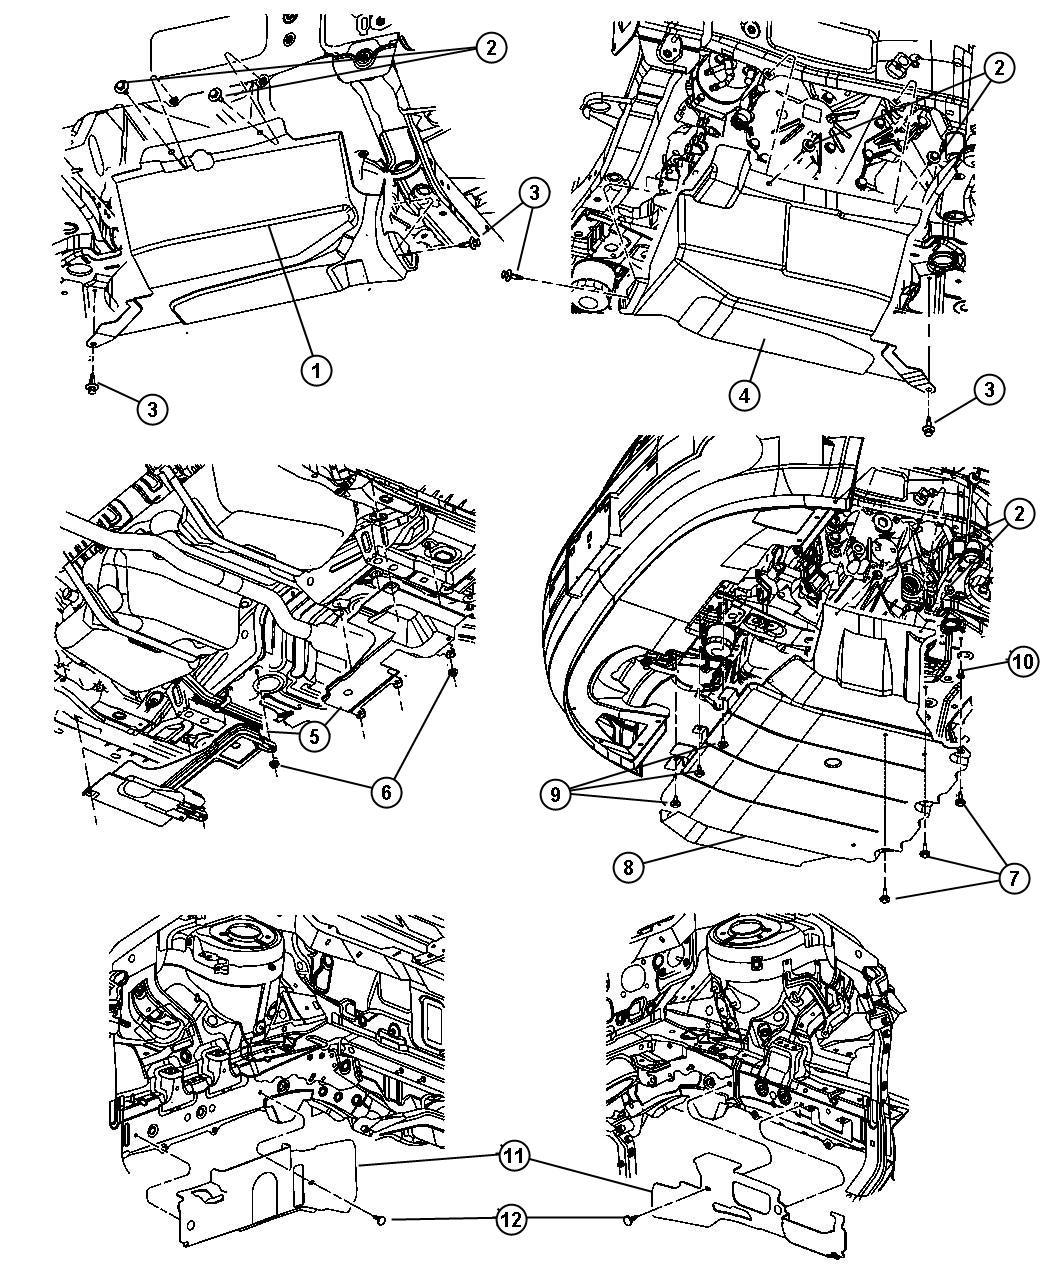 2008 Dodge Caliber Sxt Fuse Manual Wiring Source 2007 Diagram Liftgate Parts